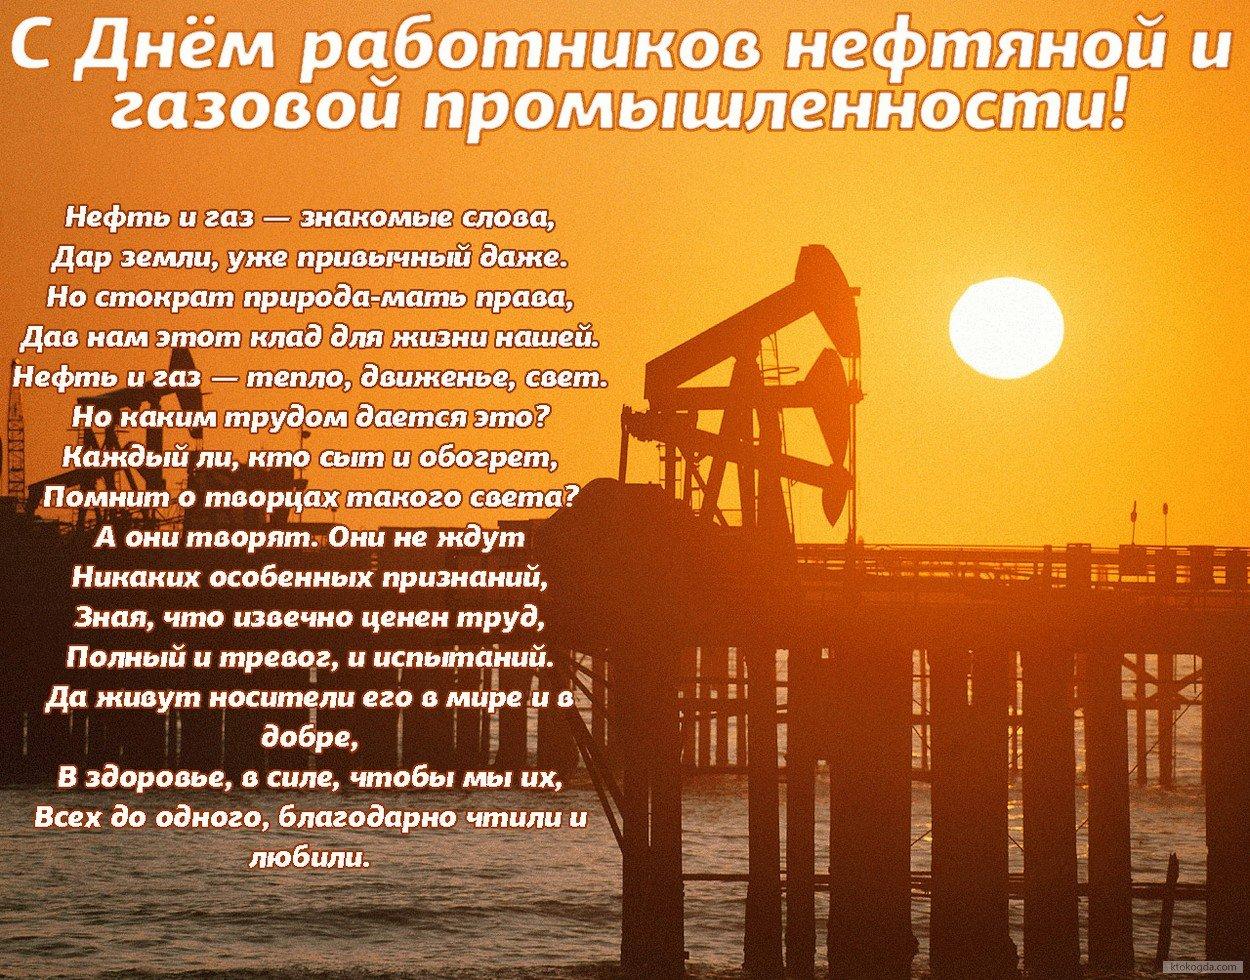 Открытки ко дня нефтяника